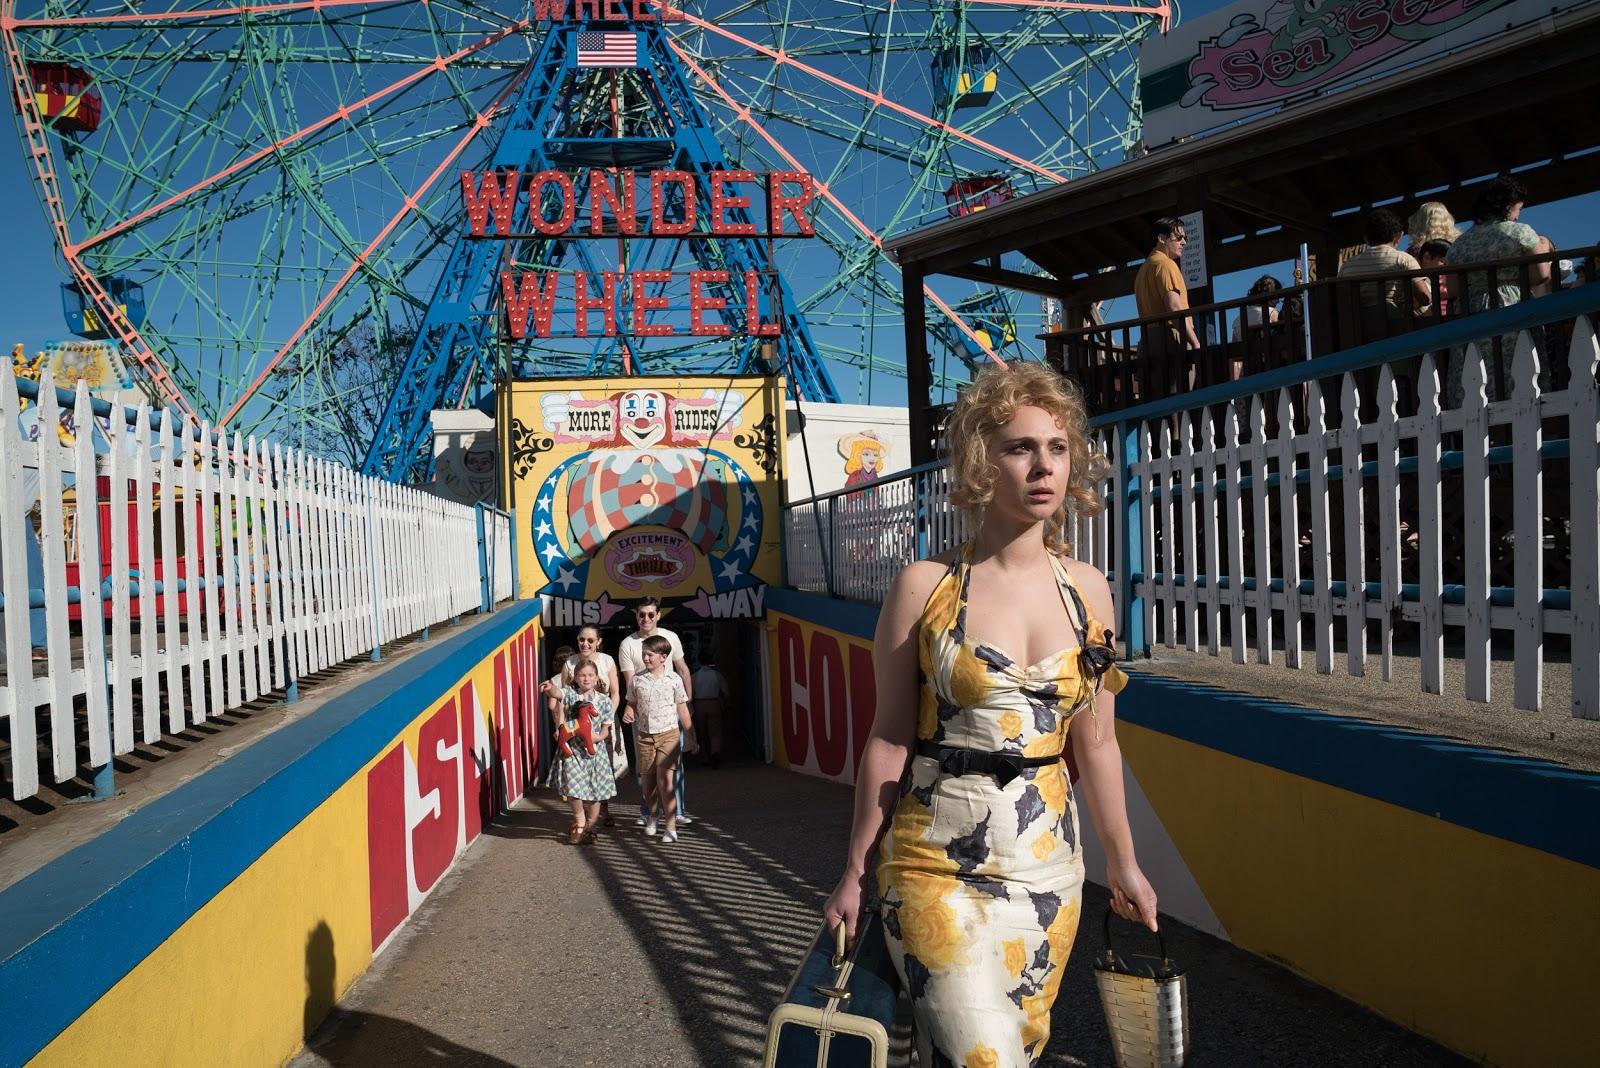 Wonder Wheel - Woody Allen